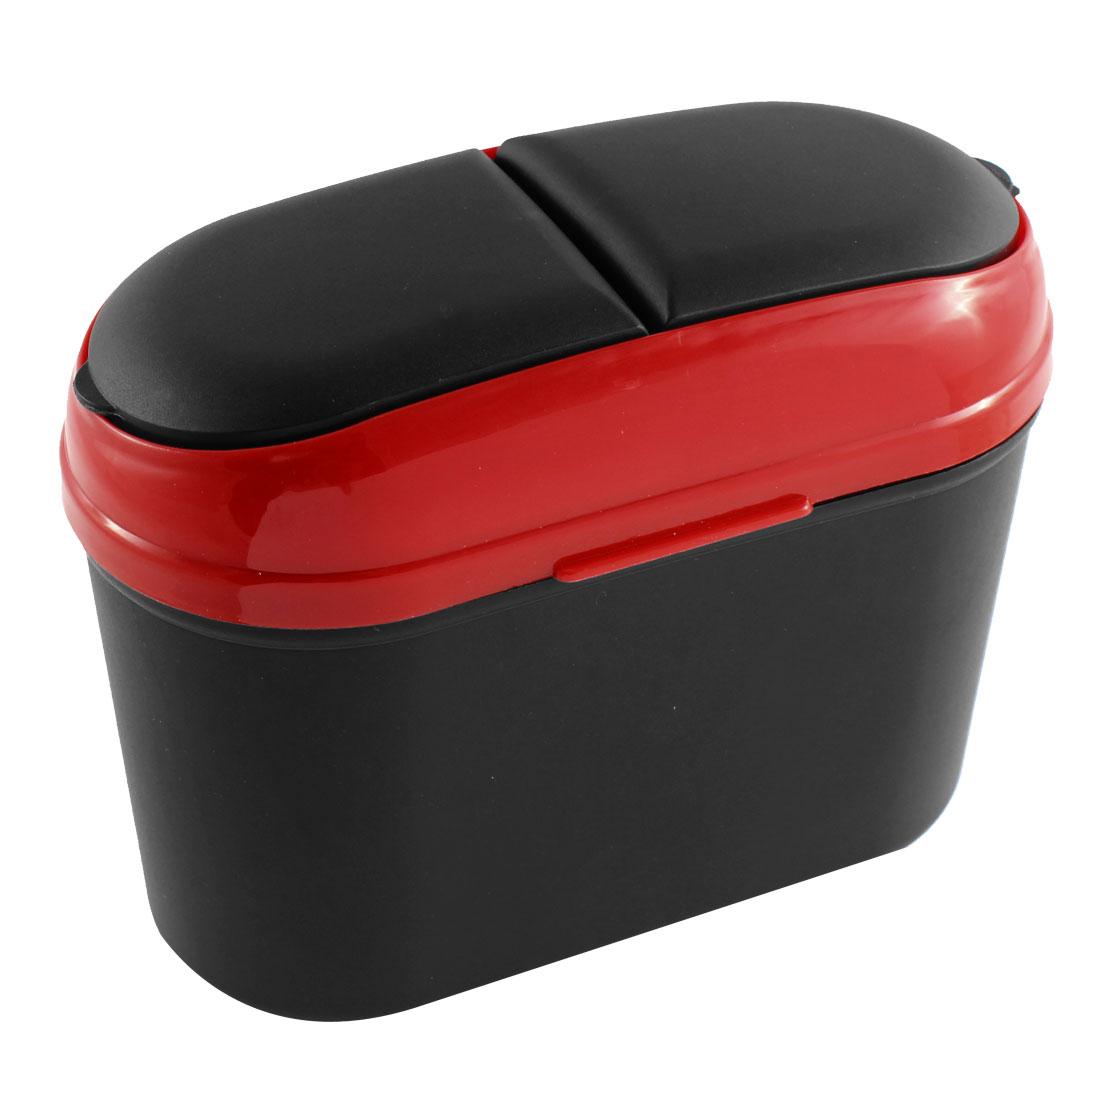 Car SUV Trash Rubbish Can Garbage Dust Dustbin Box Case Holder Bin Hook Black Red